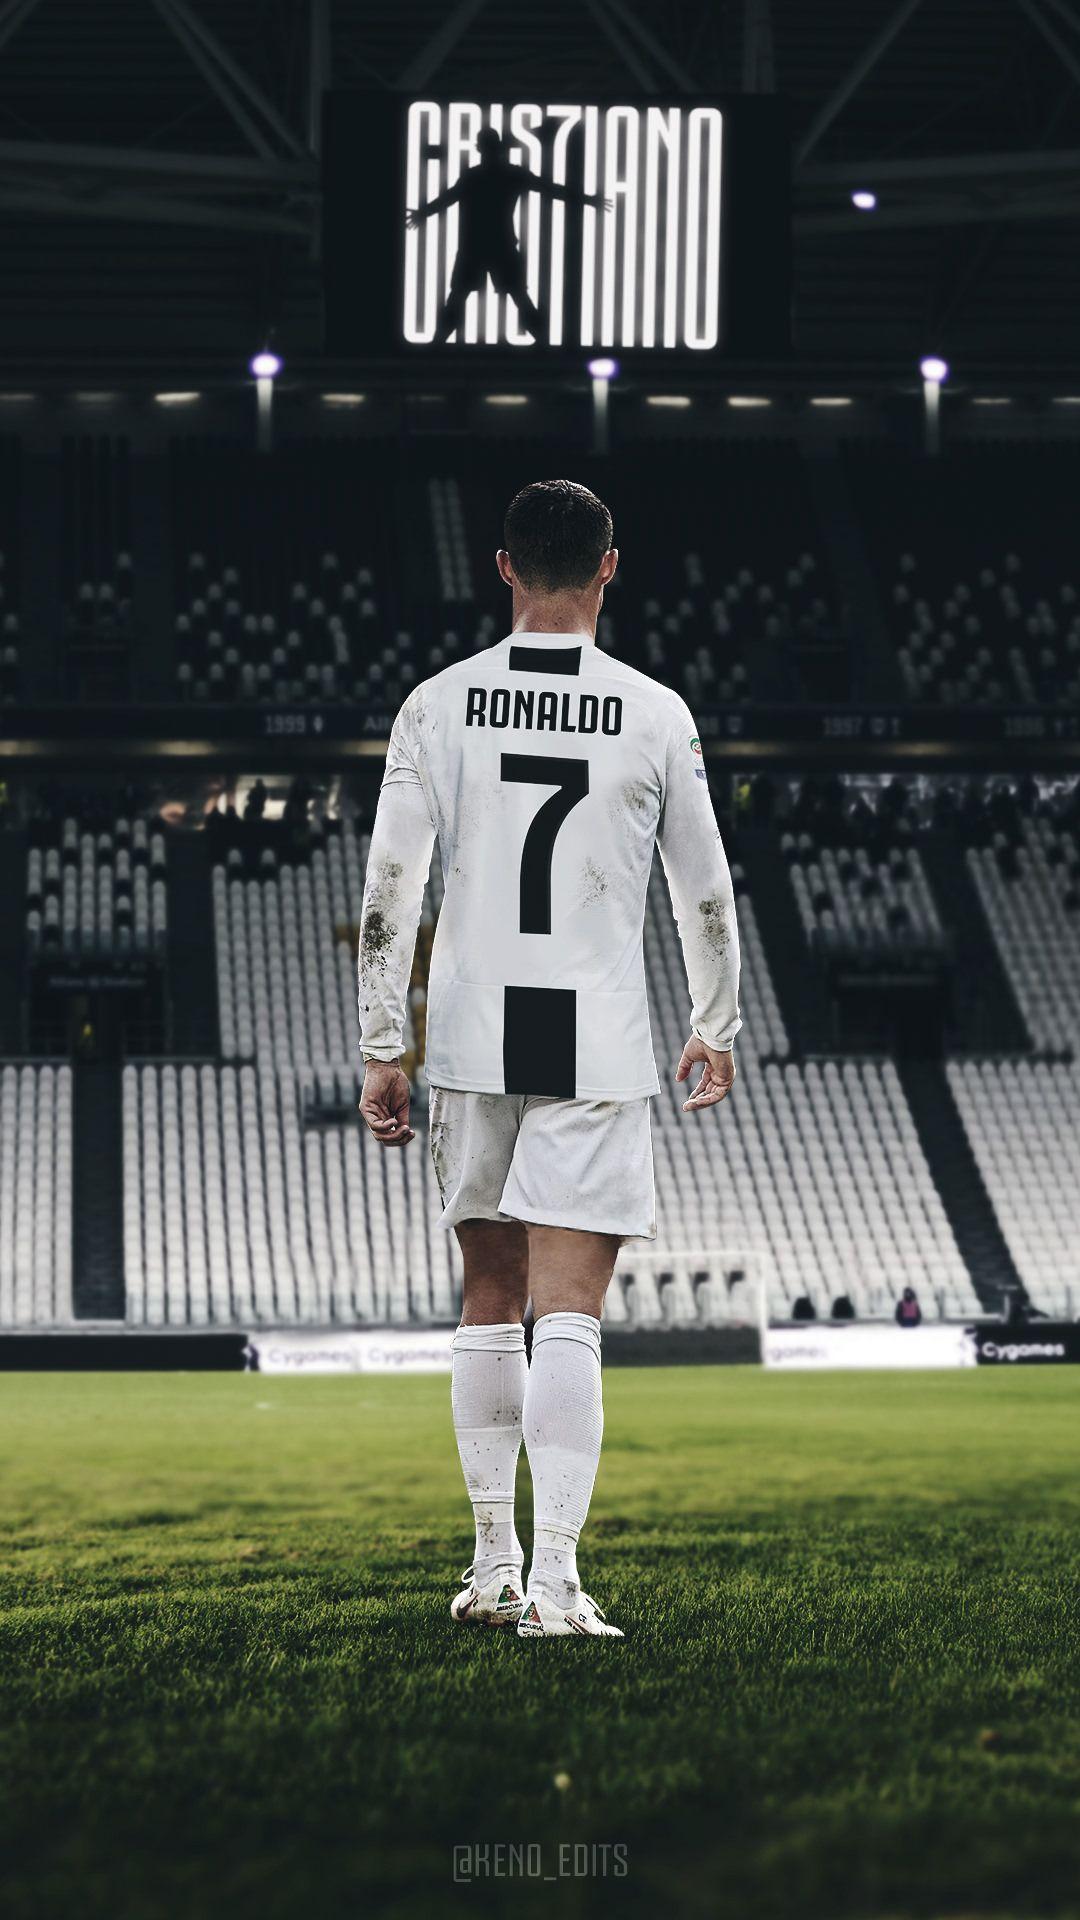 Cris7iano Follow Me On Ig Keno Edits Ronaldo Juventus